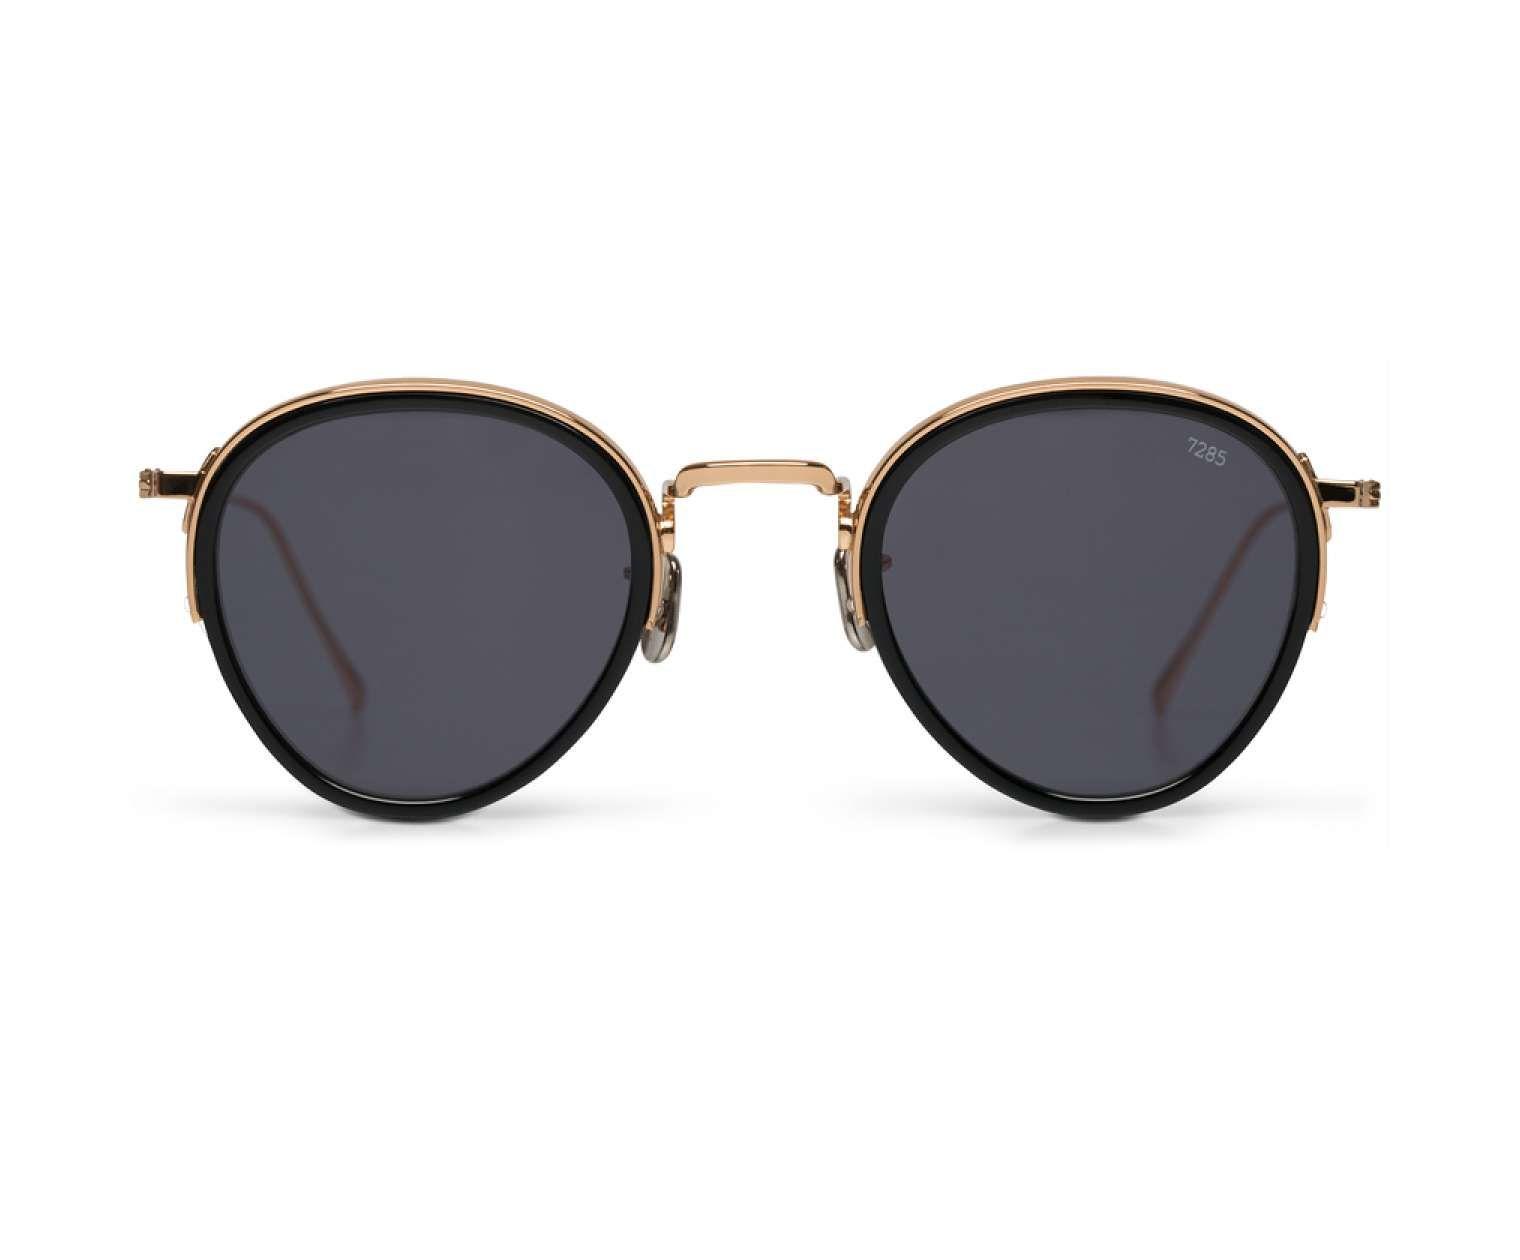 Eyevan 7285 Model 732 Black Sunglasses